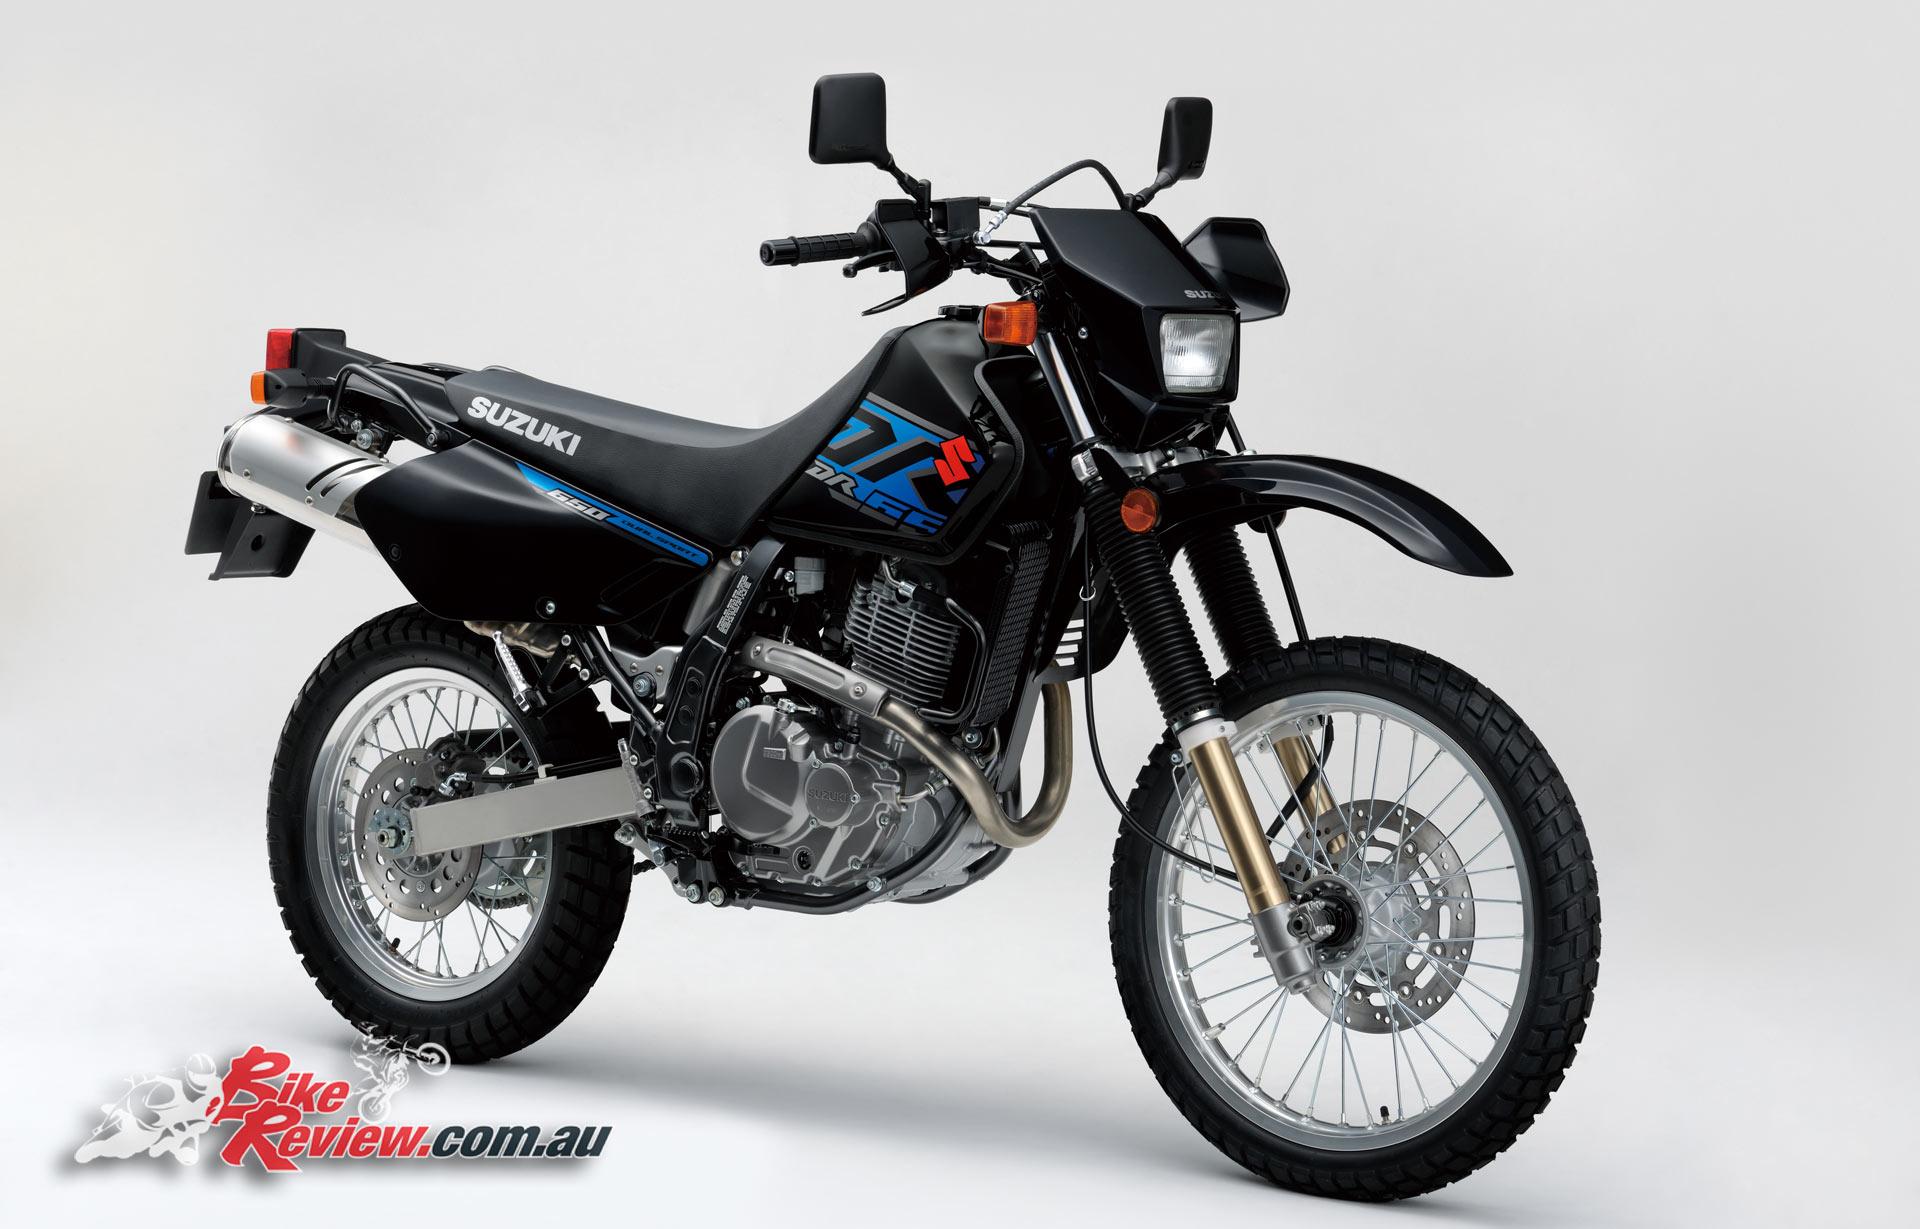 2017 Suzuki Dr650se On Sale Now Bike Review